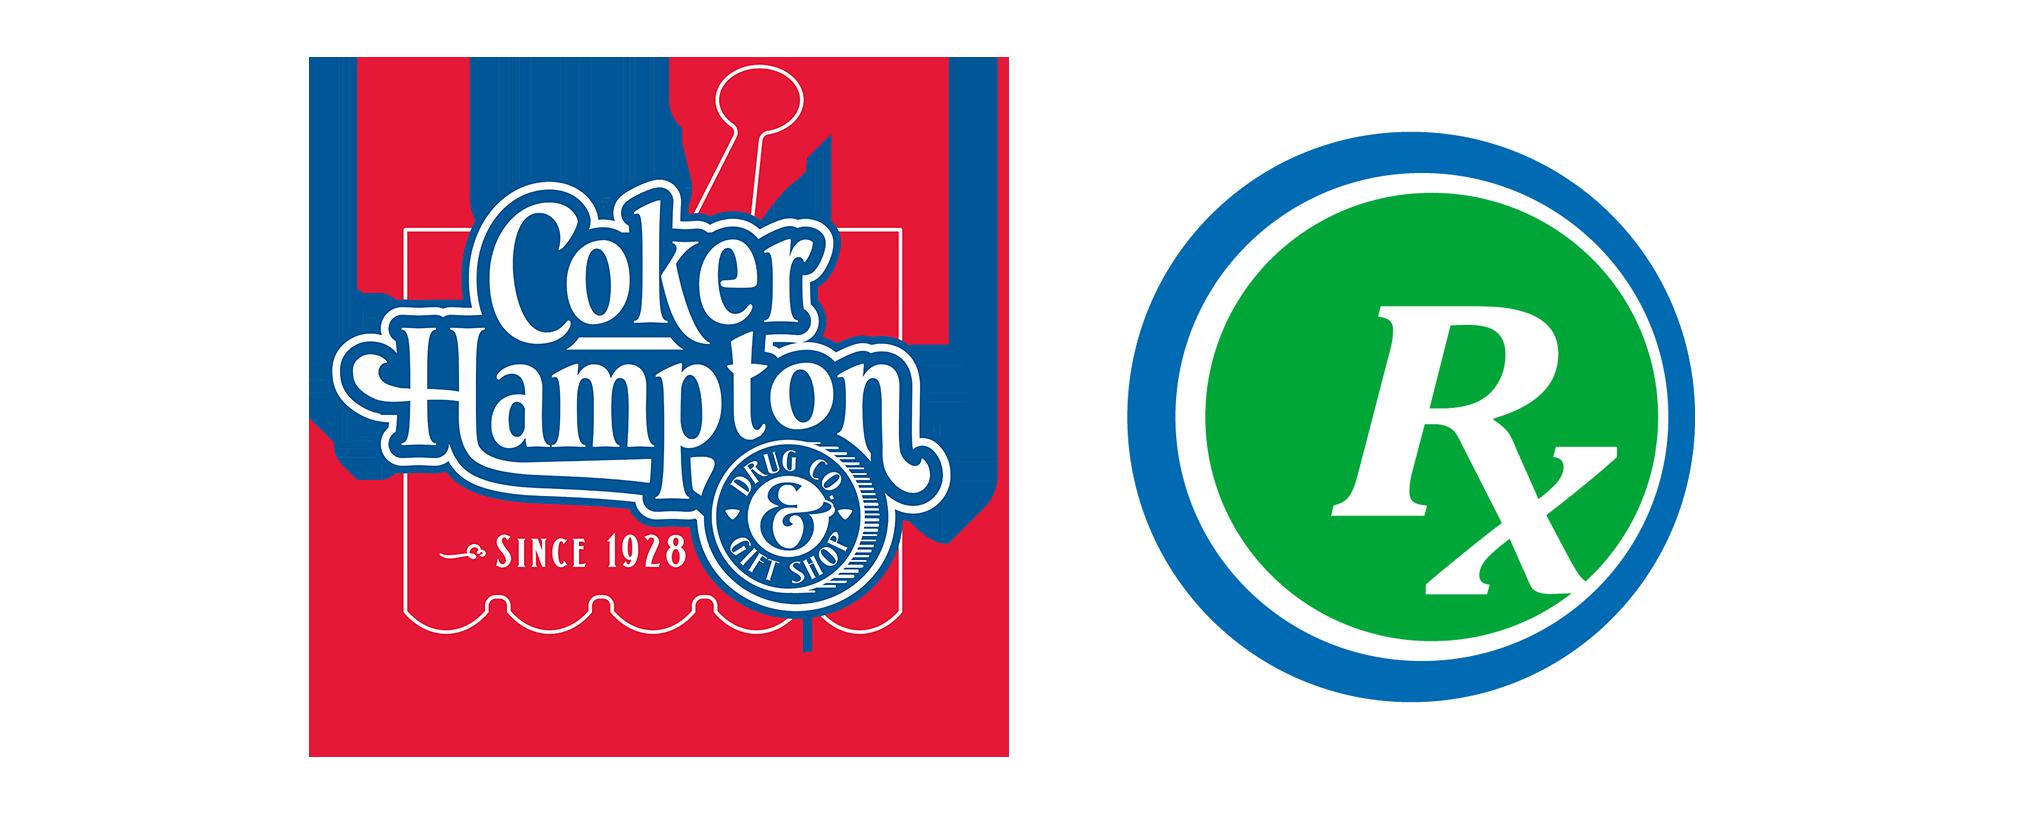 Coker Hampton Drug Company